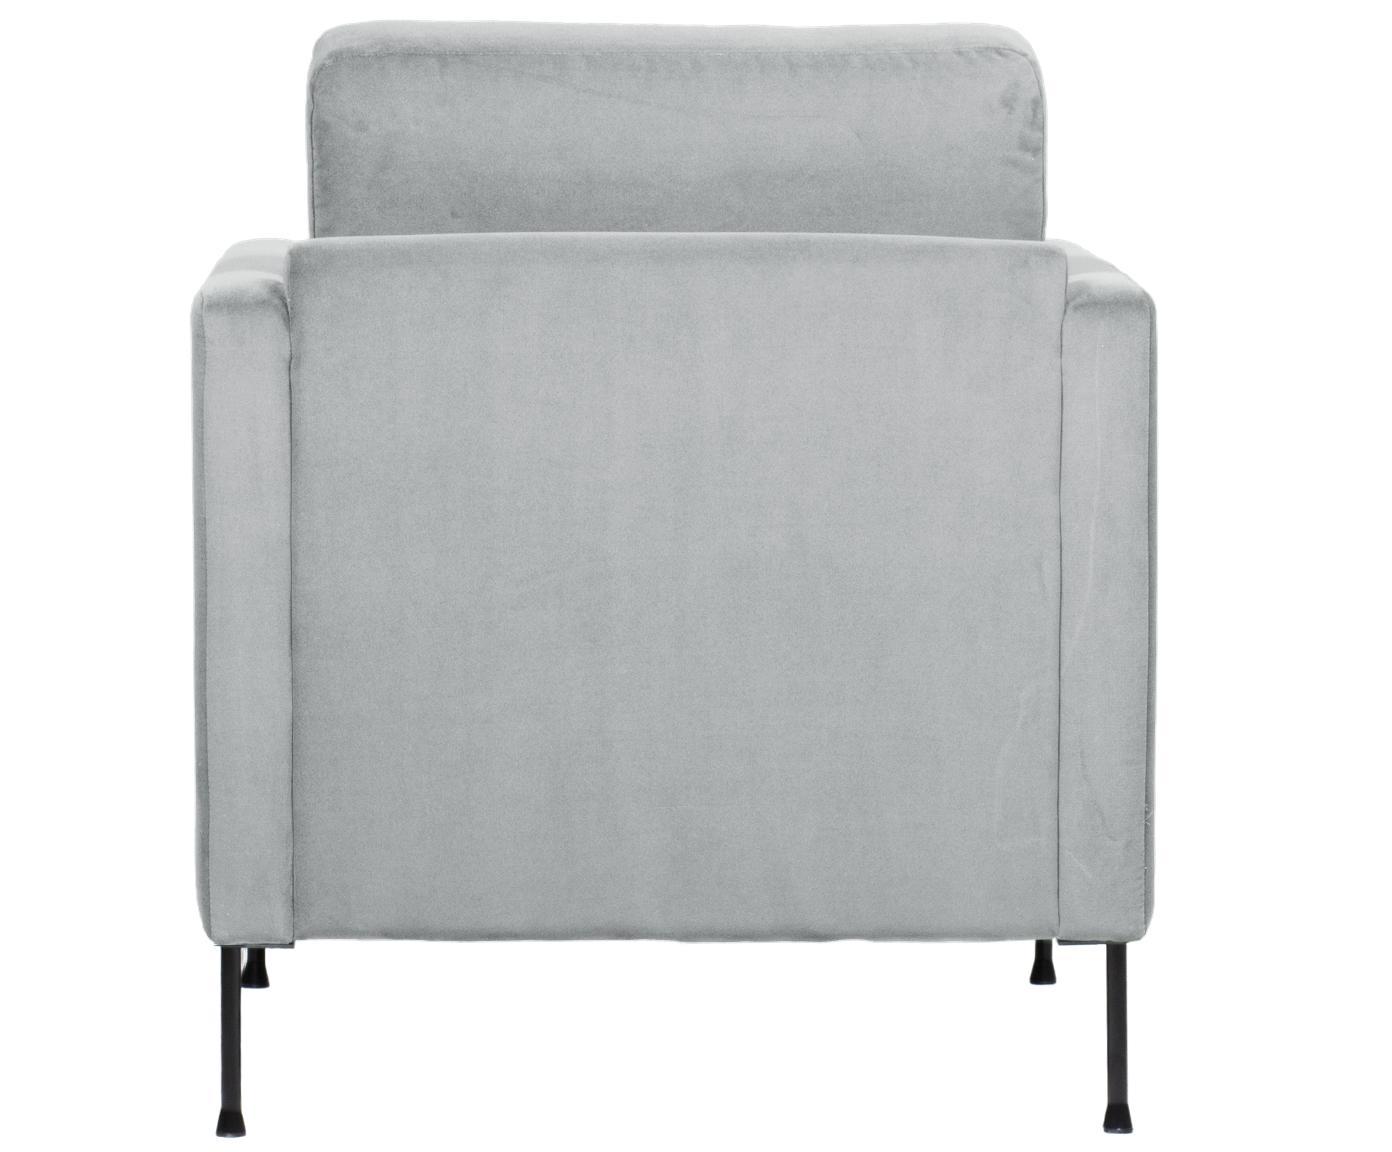 Samt-Sessel Fluente, Bezug: Samt (Hochwertiger Polyes, Gestell: Massives Kiefernholz, Füße: Metall, lackiert, Samt Hellgrau, B 76 x T 83 cm